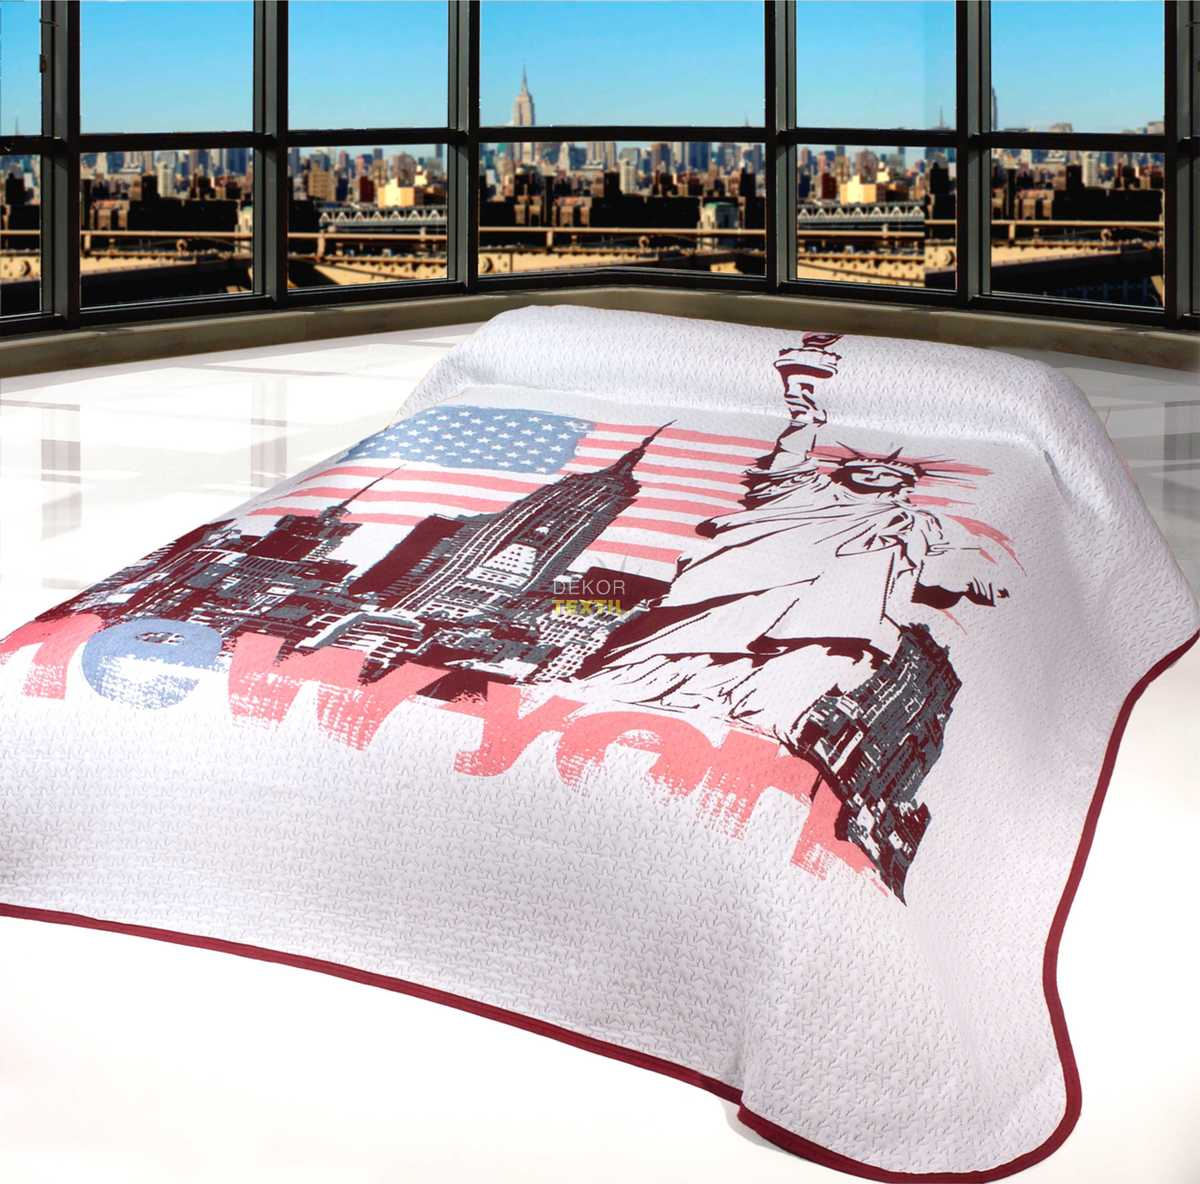 Forbyt, Přehoz na postel, New York, bordový 140 x 220 cm